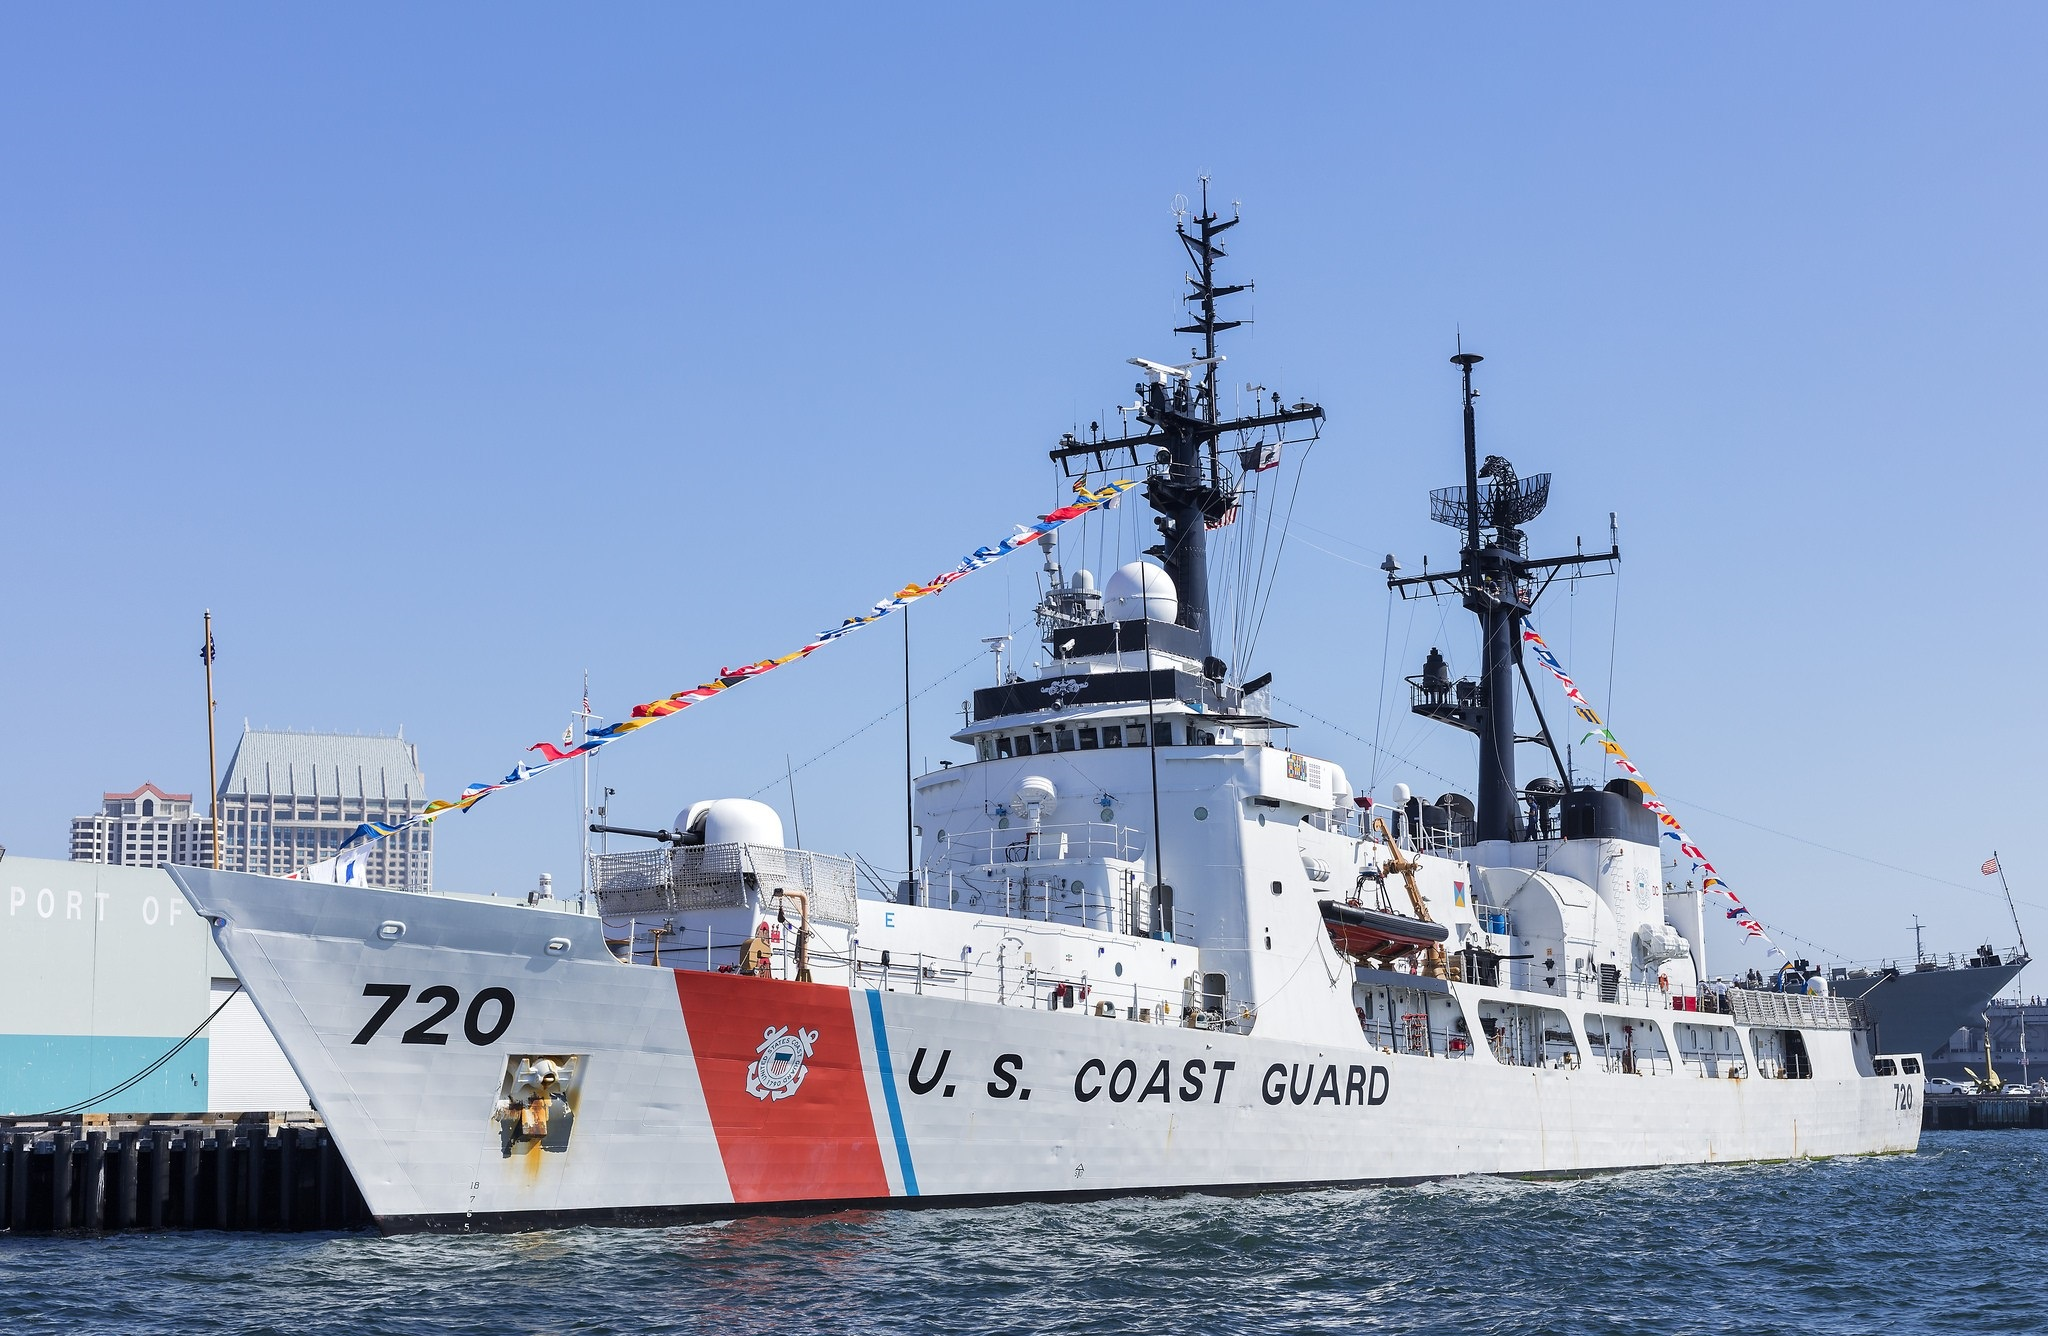 Coast Guard Hd Wallpaper Background Image 2048x1336 Id